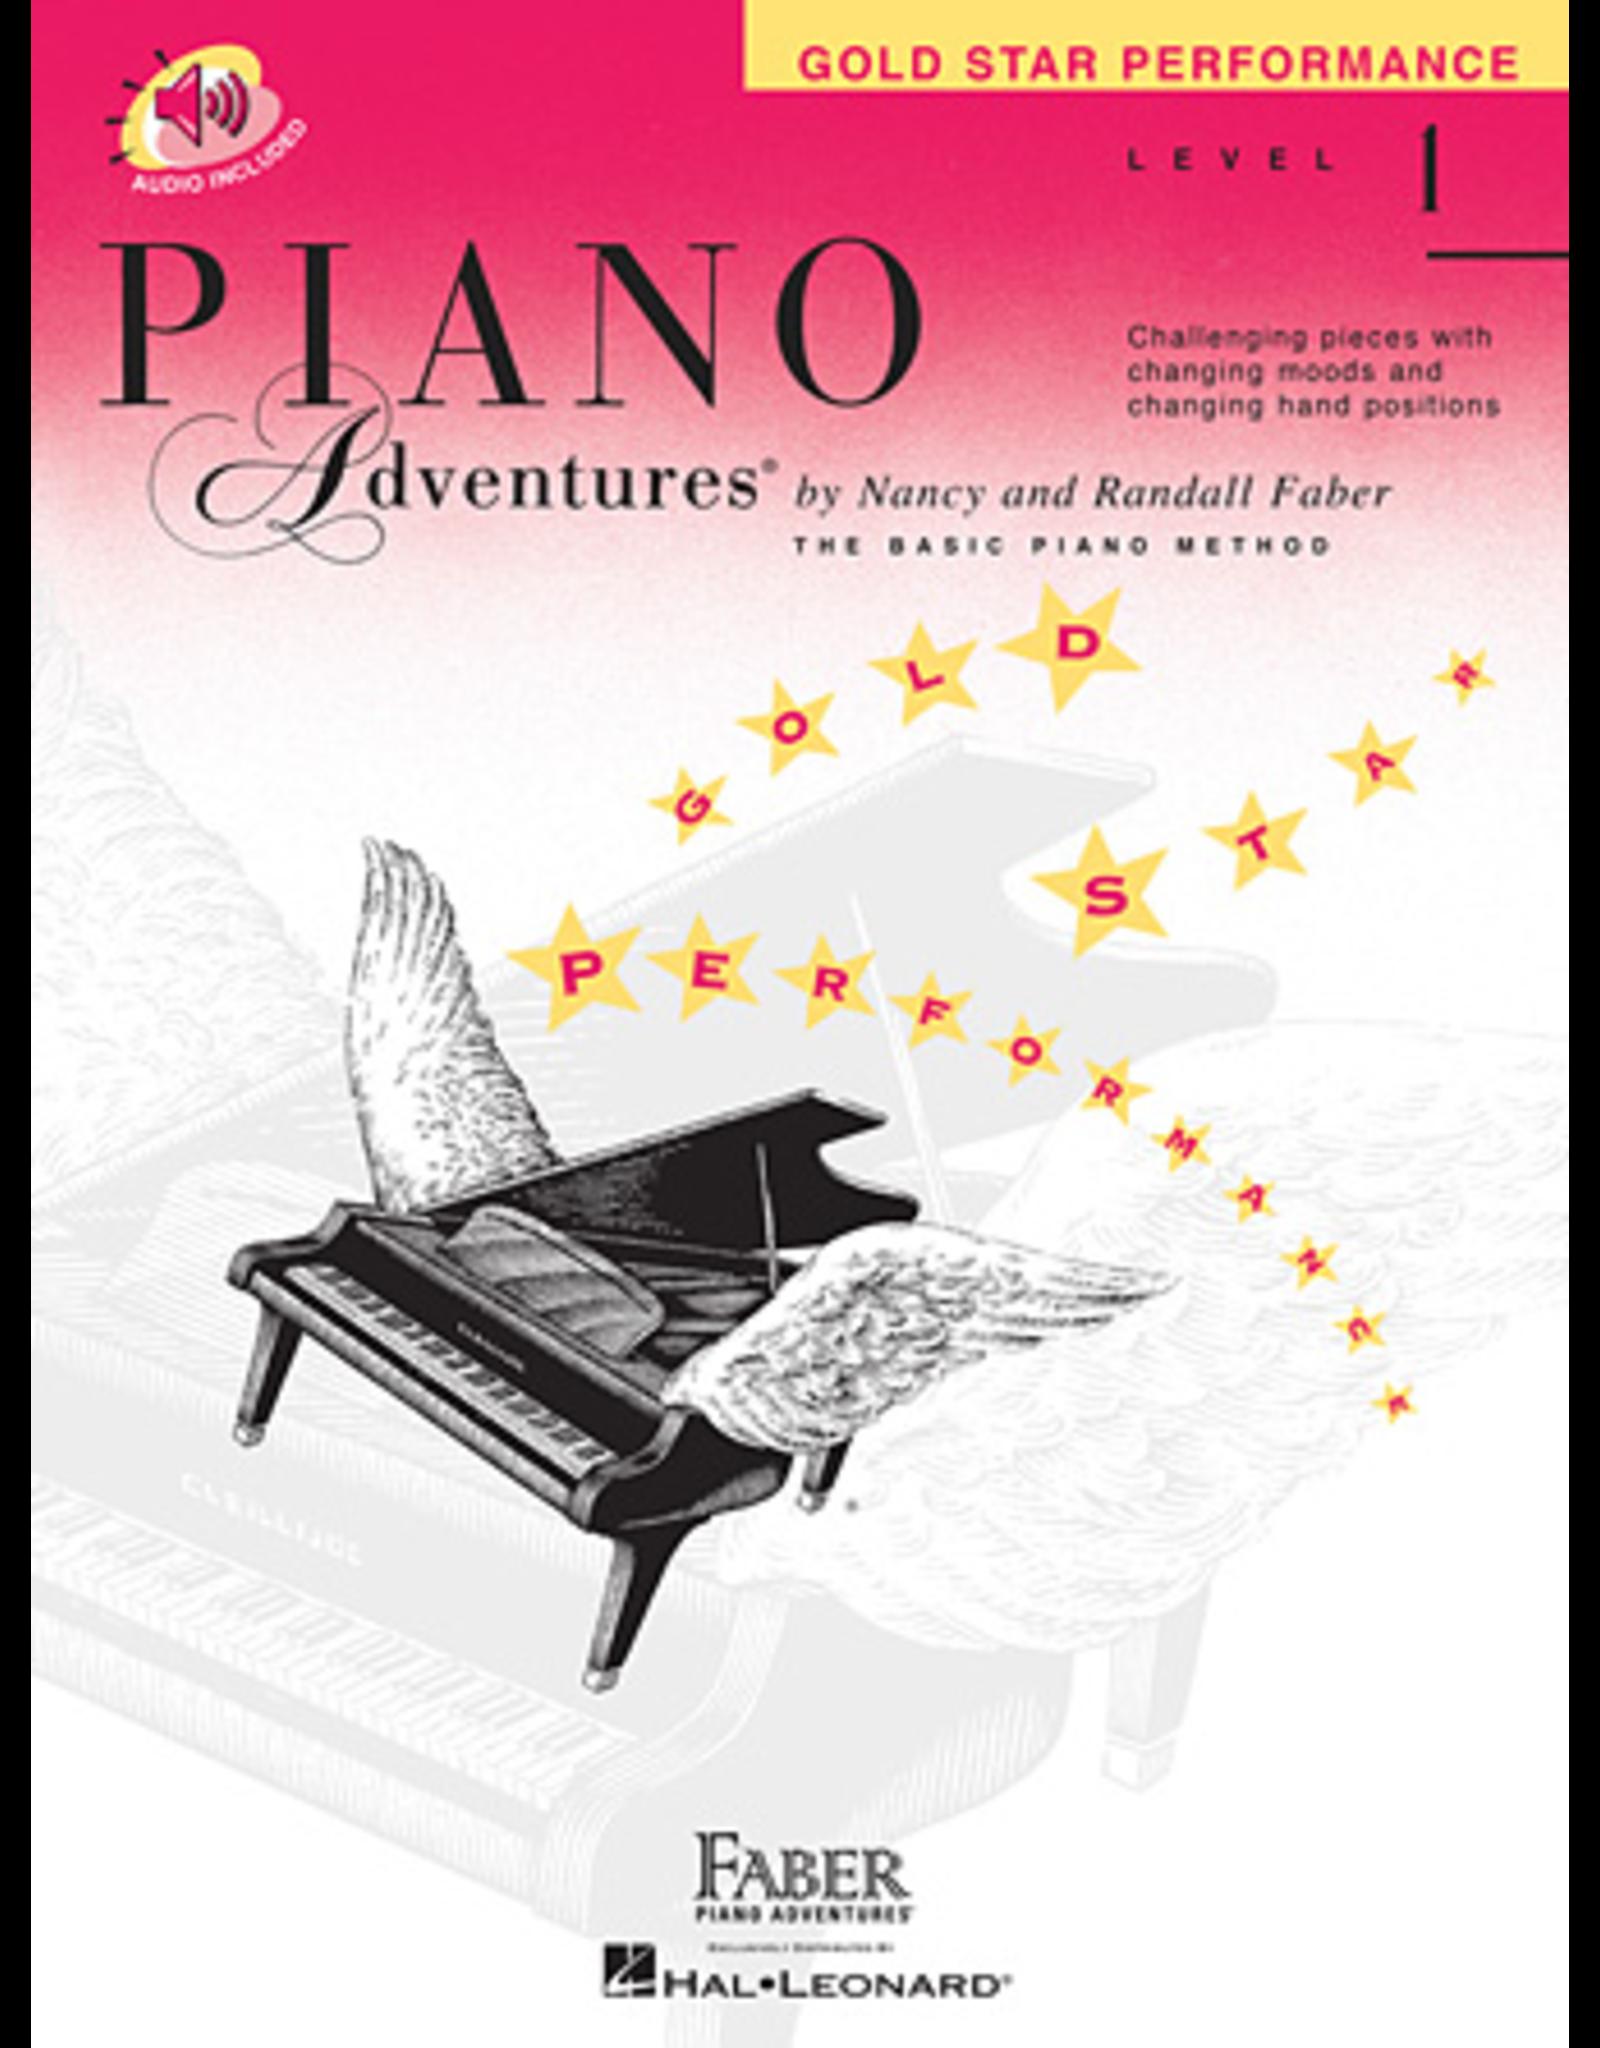 Hal Leonard Piano Adventures Gold Star Performance, Level 1